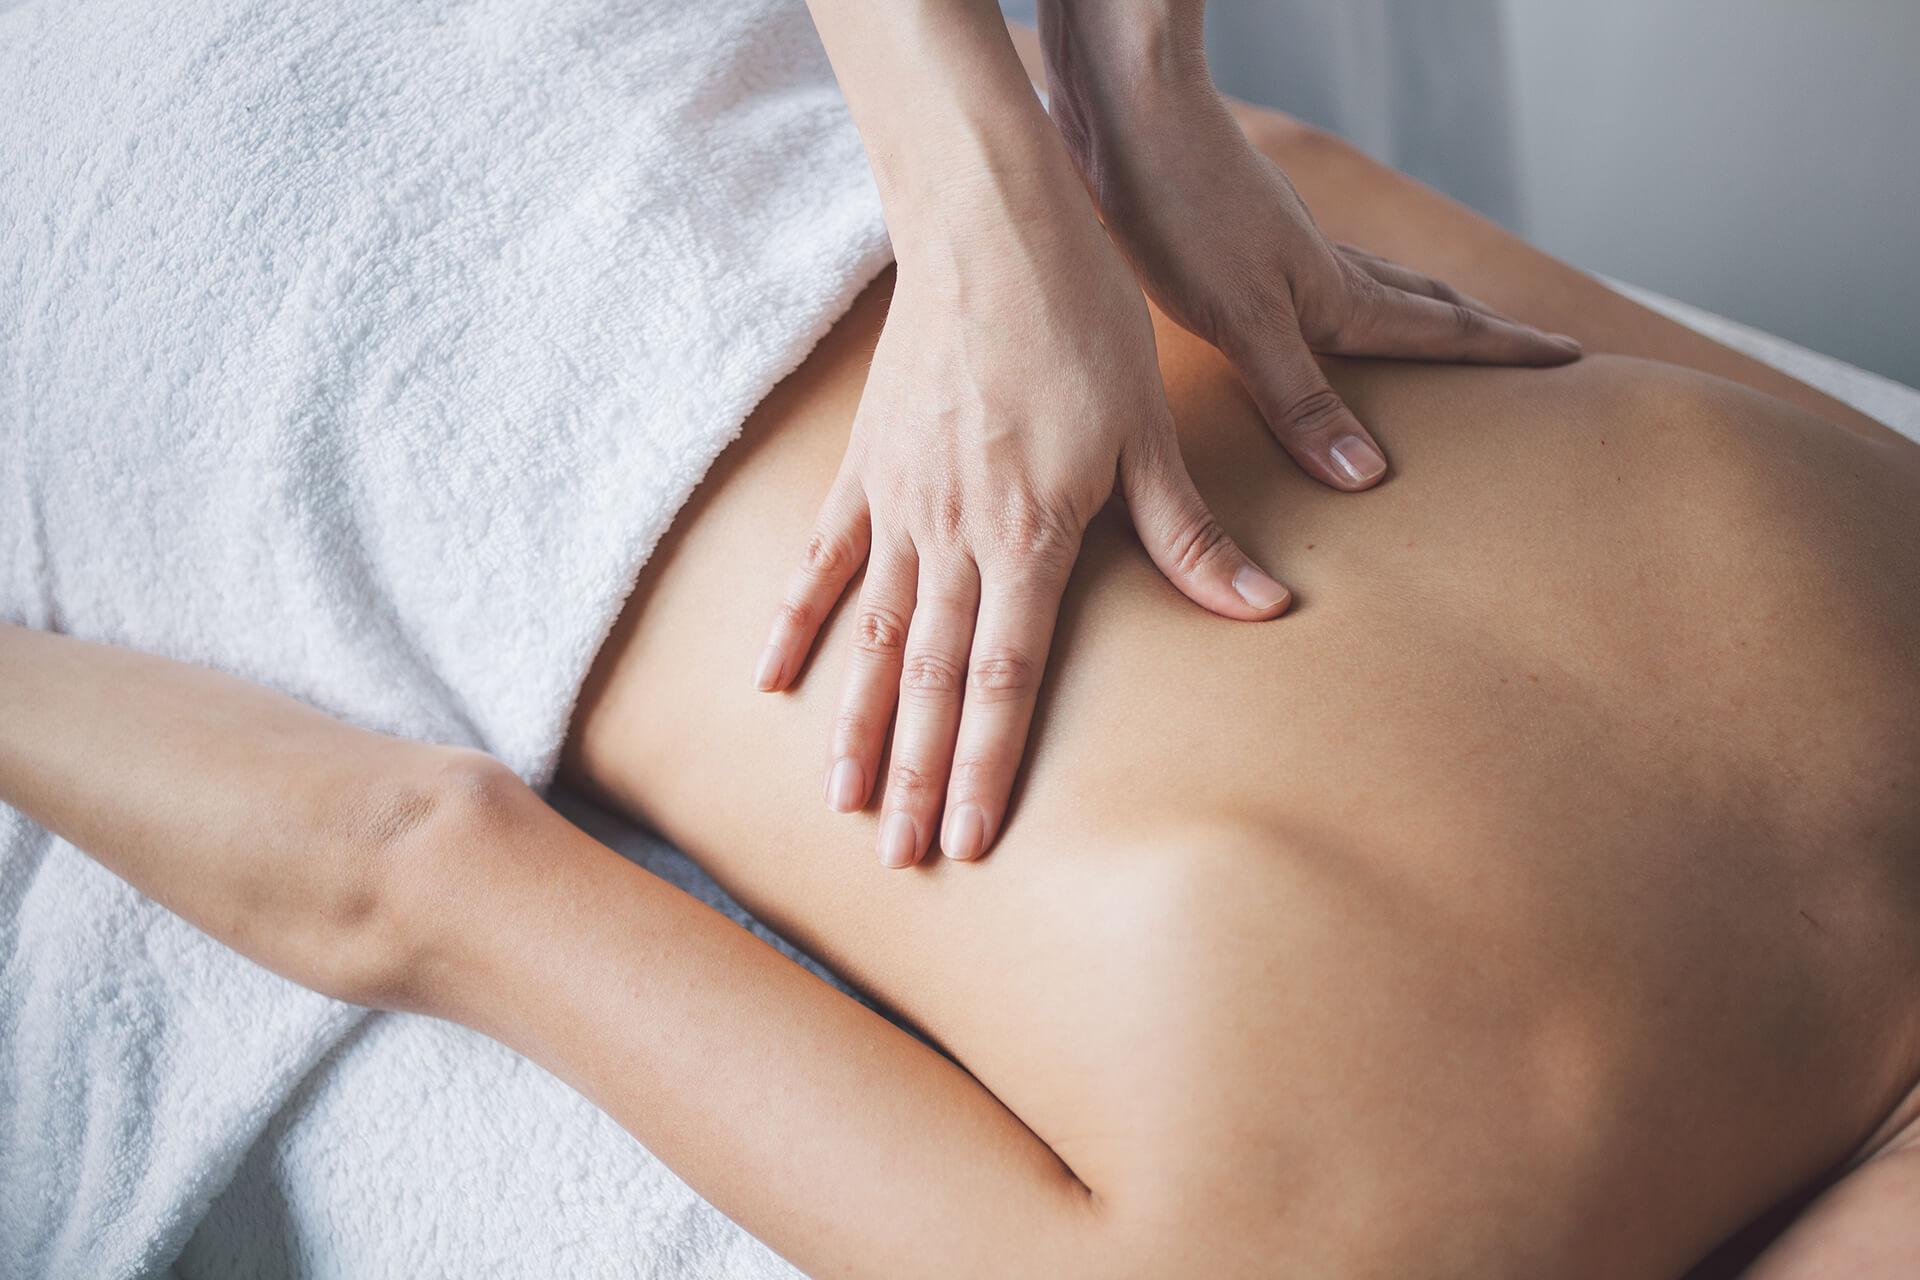 Swedish massage vs. therapeutic massage: what differences?